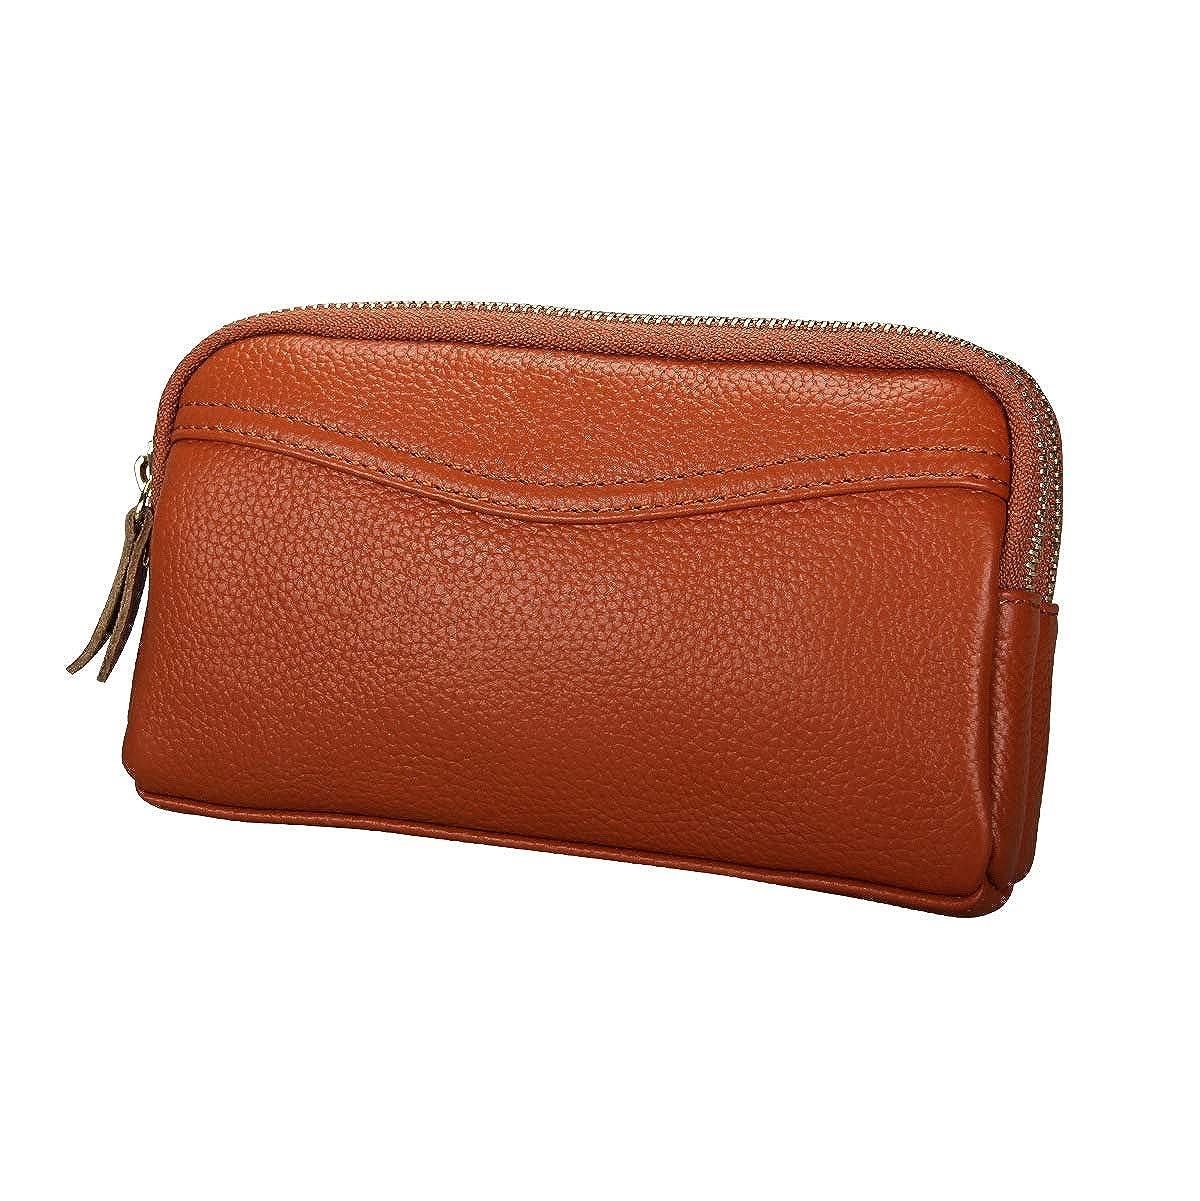 c19692f390a8 LJYH black women's genuine leather holder handbag double zipper coin ...